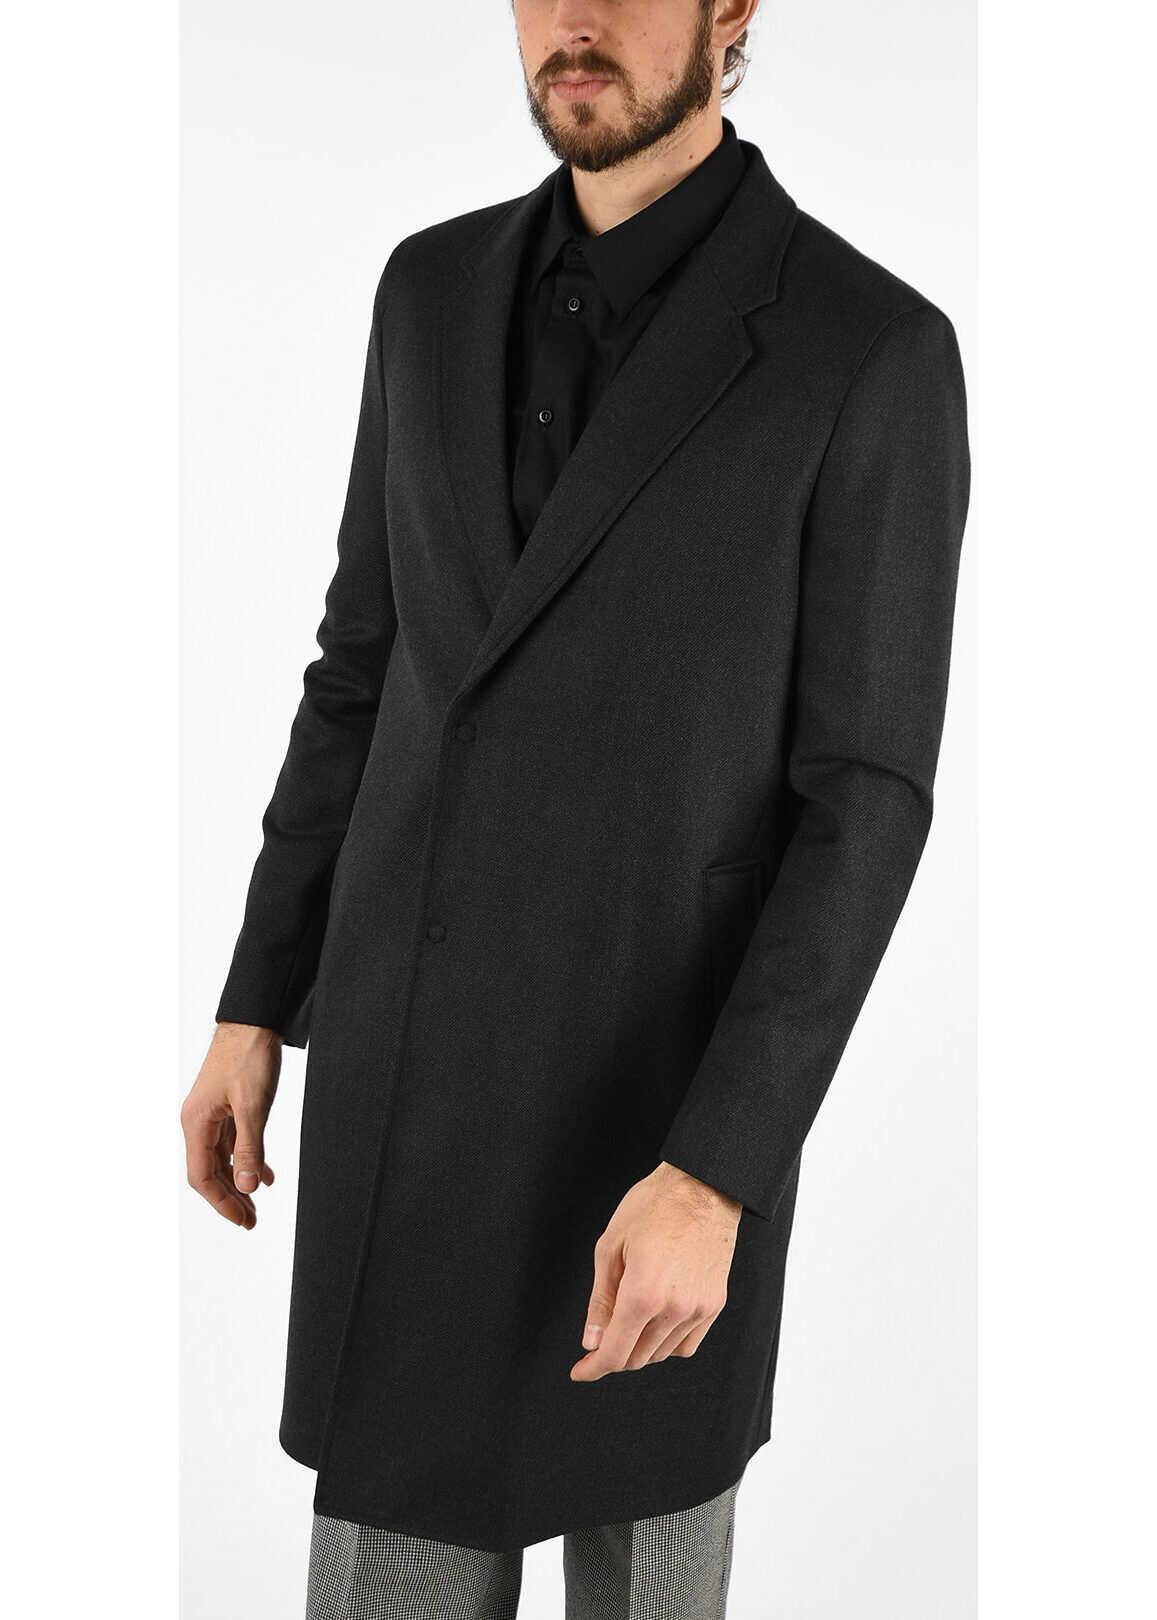 Armani EMPORIO Wool Coat GRAY